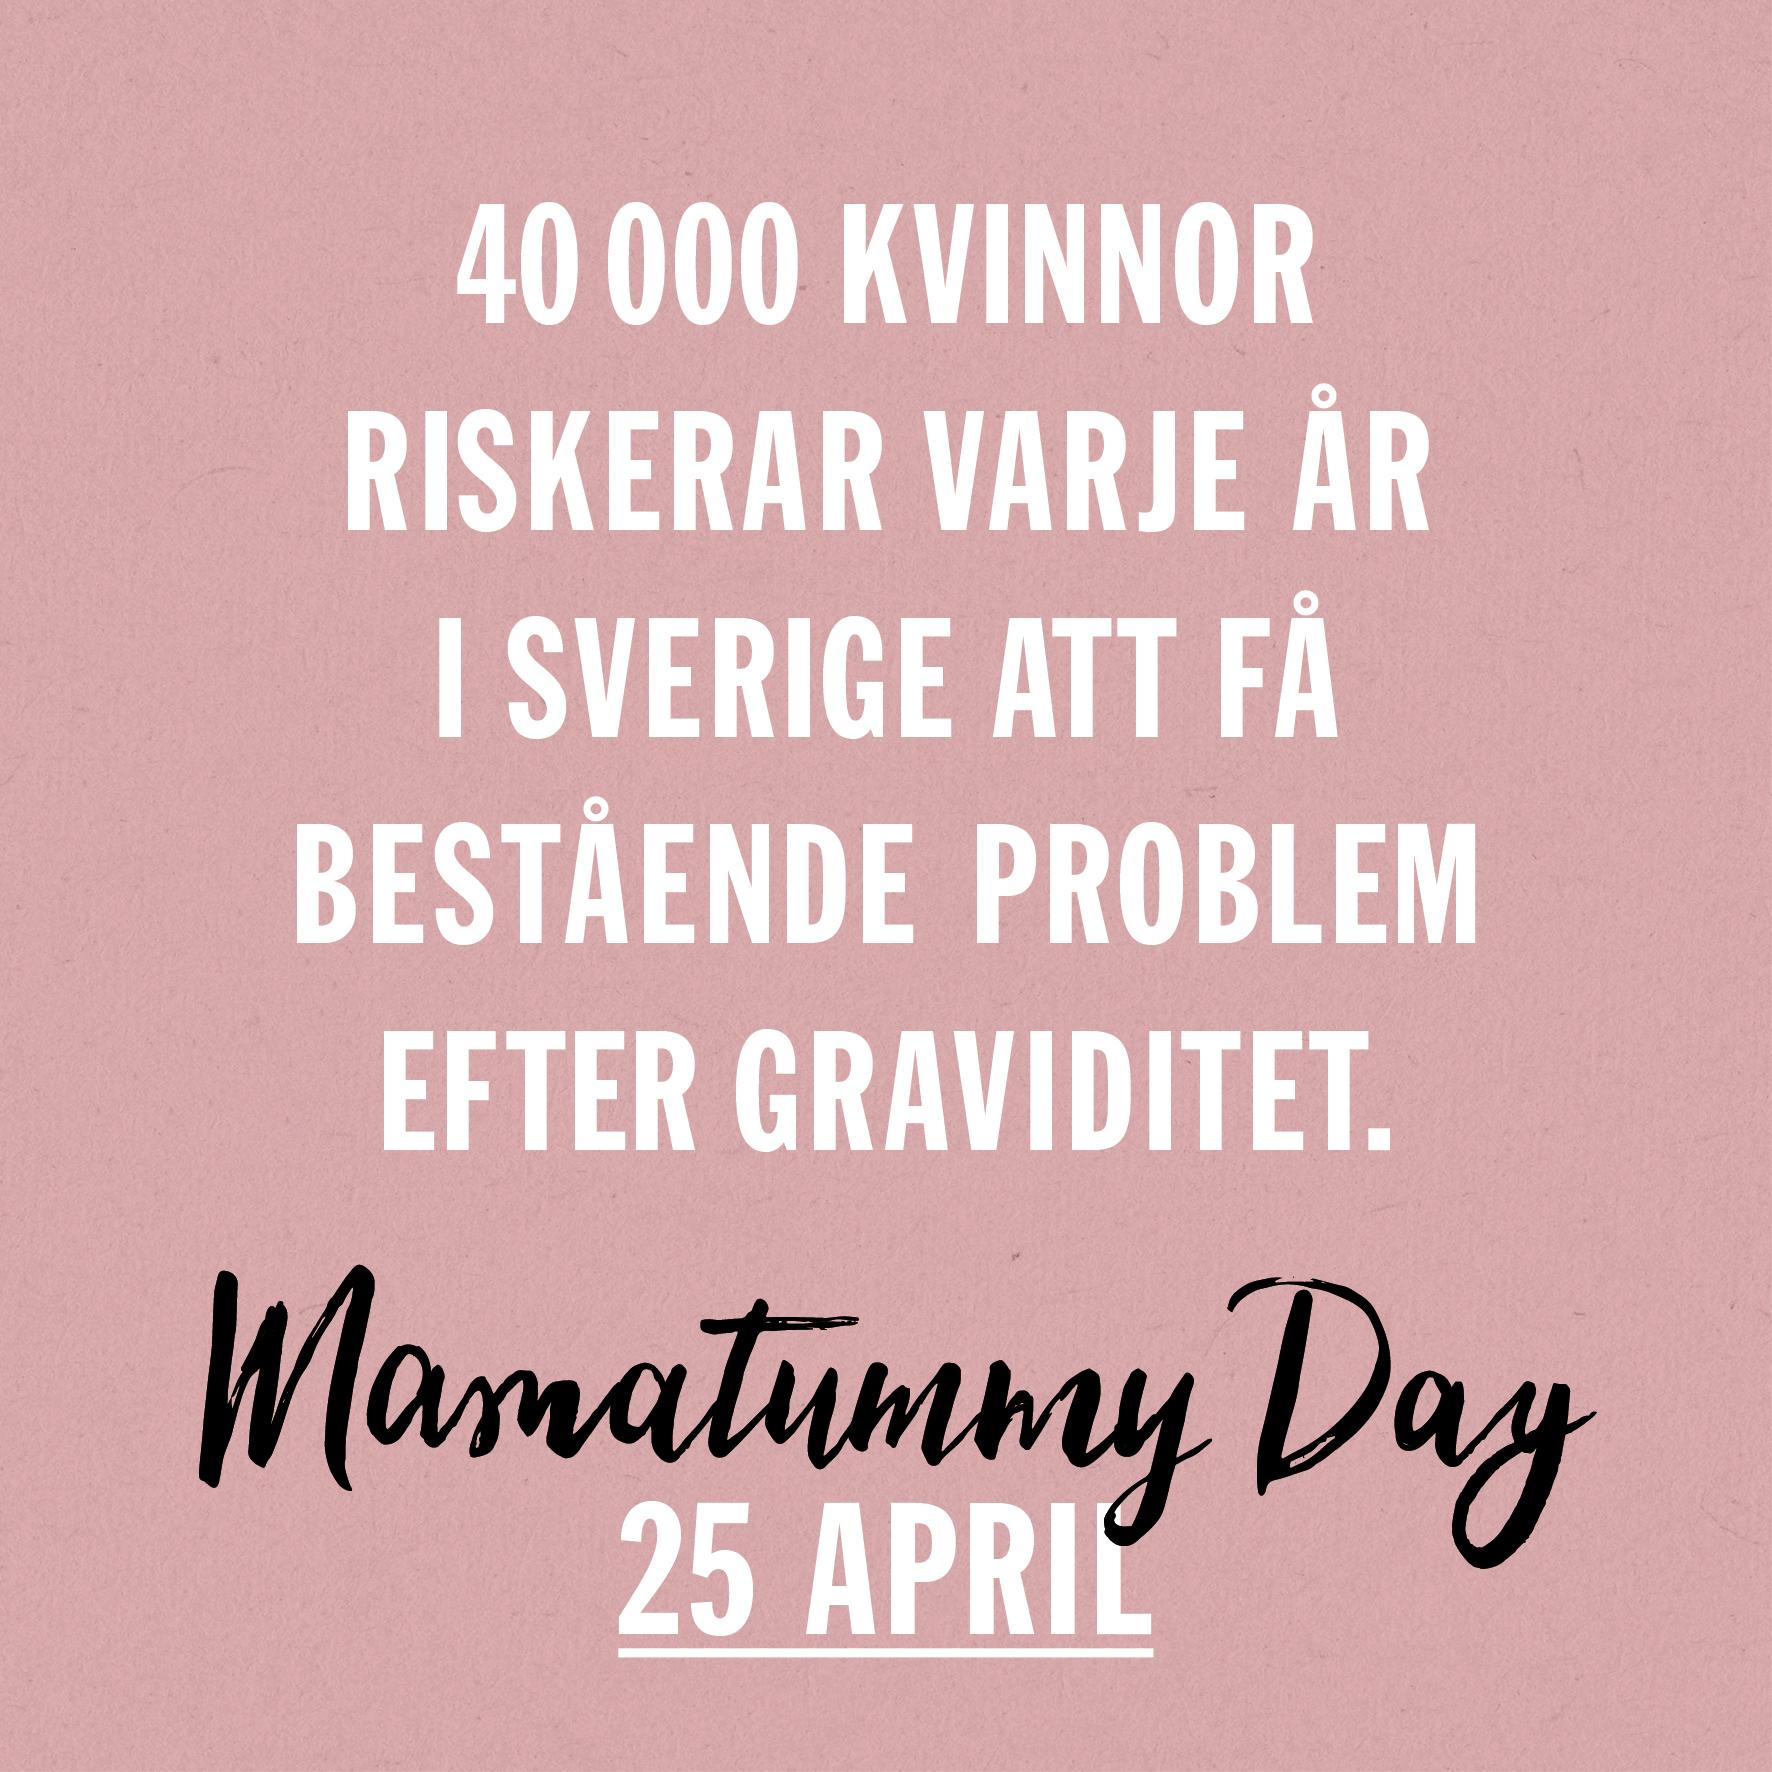 Om Mamatummy Day 2016